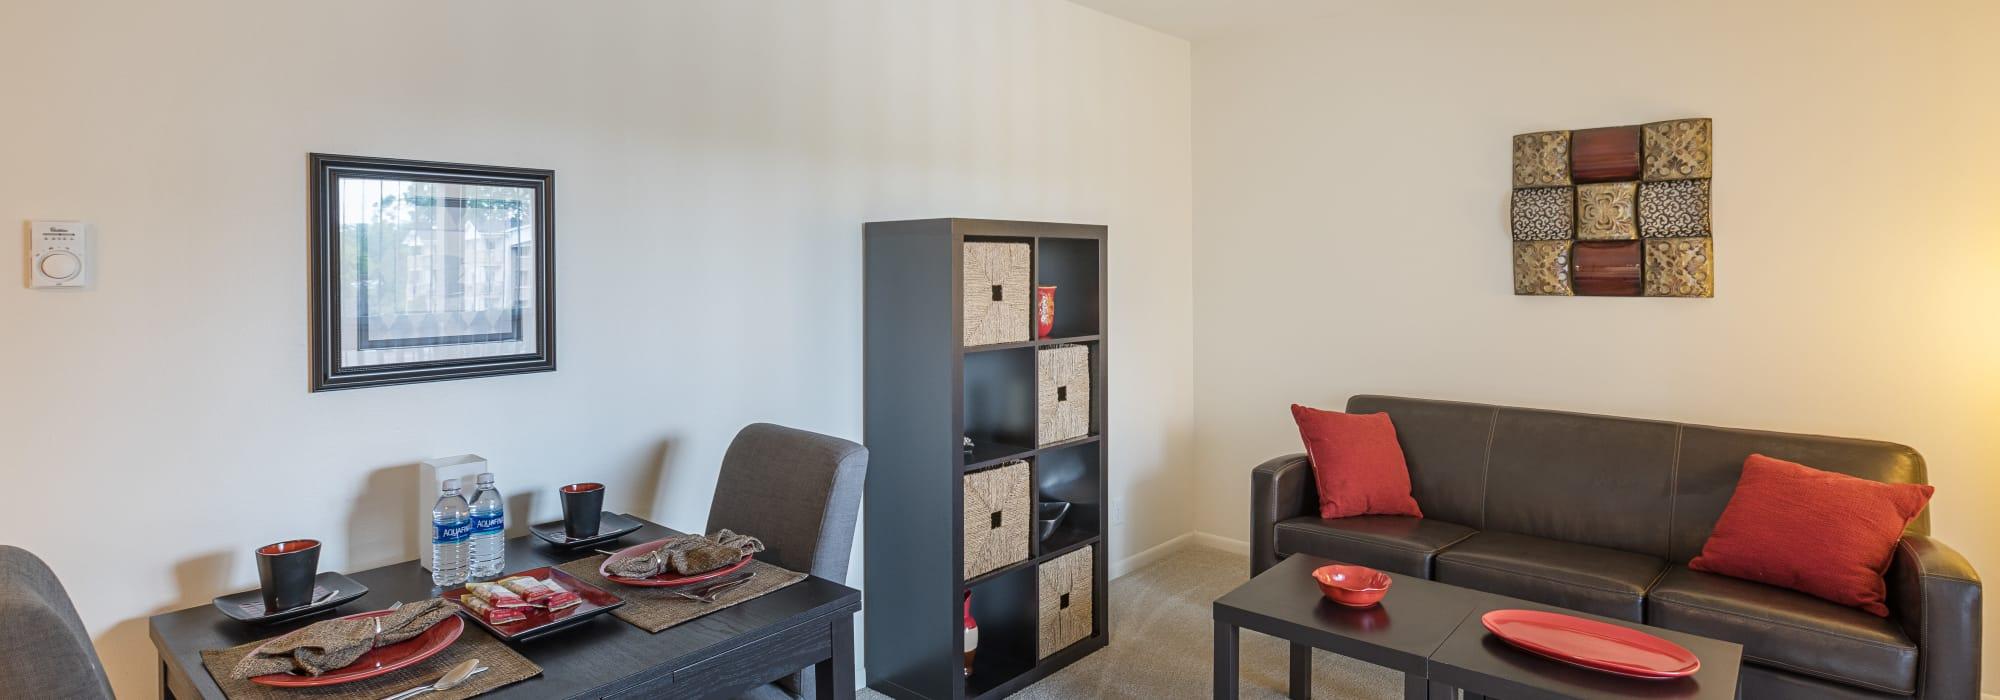 Creek Club Apartments offers luxury apartments in Williamston, Michigan